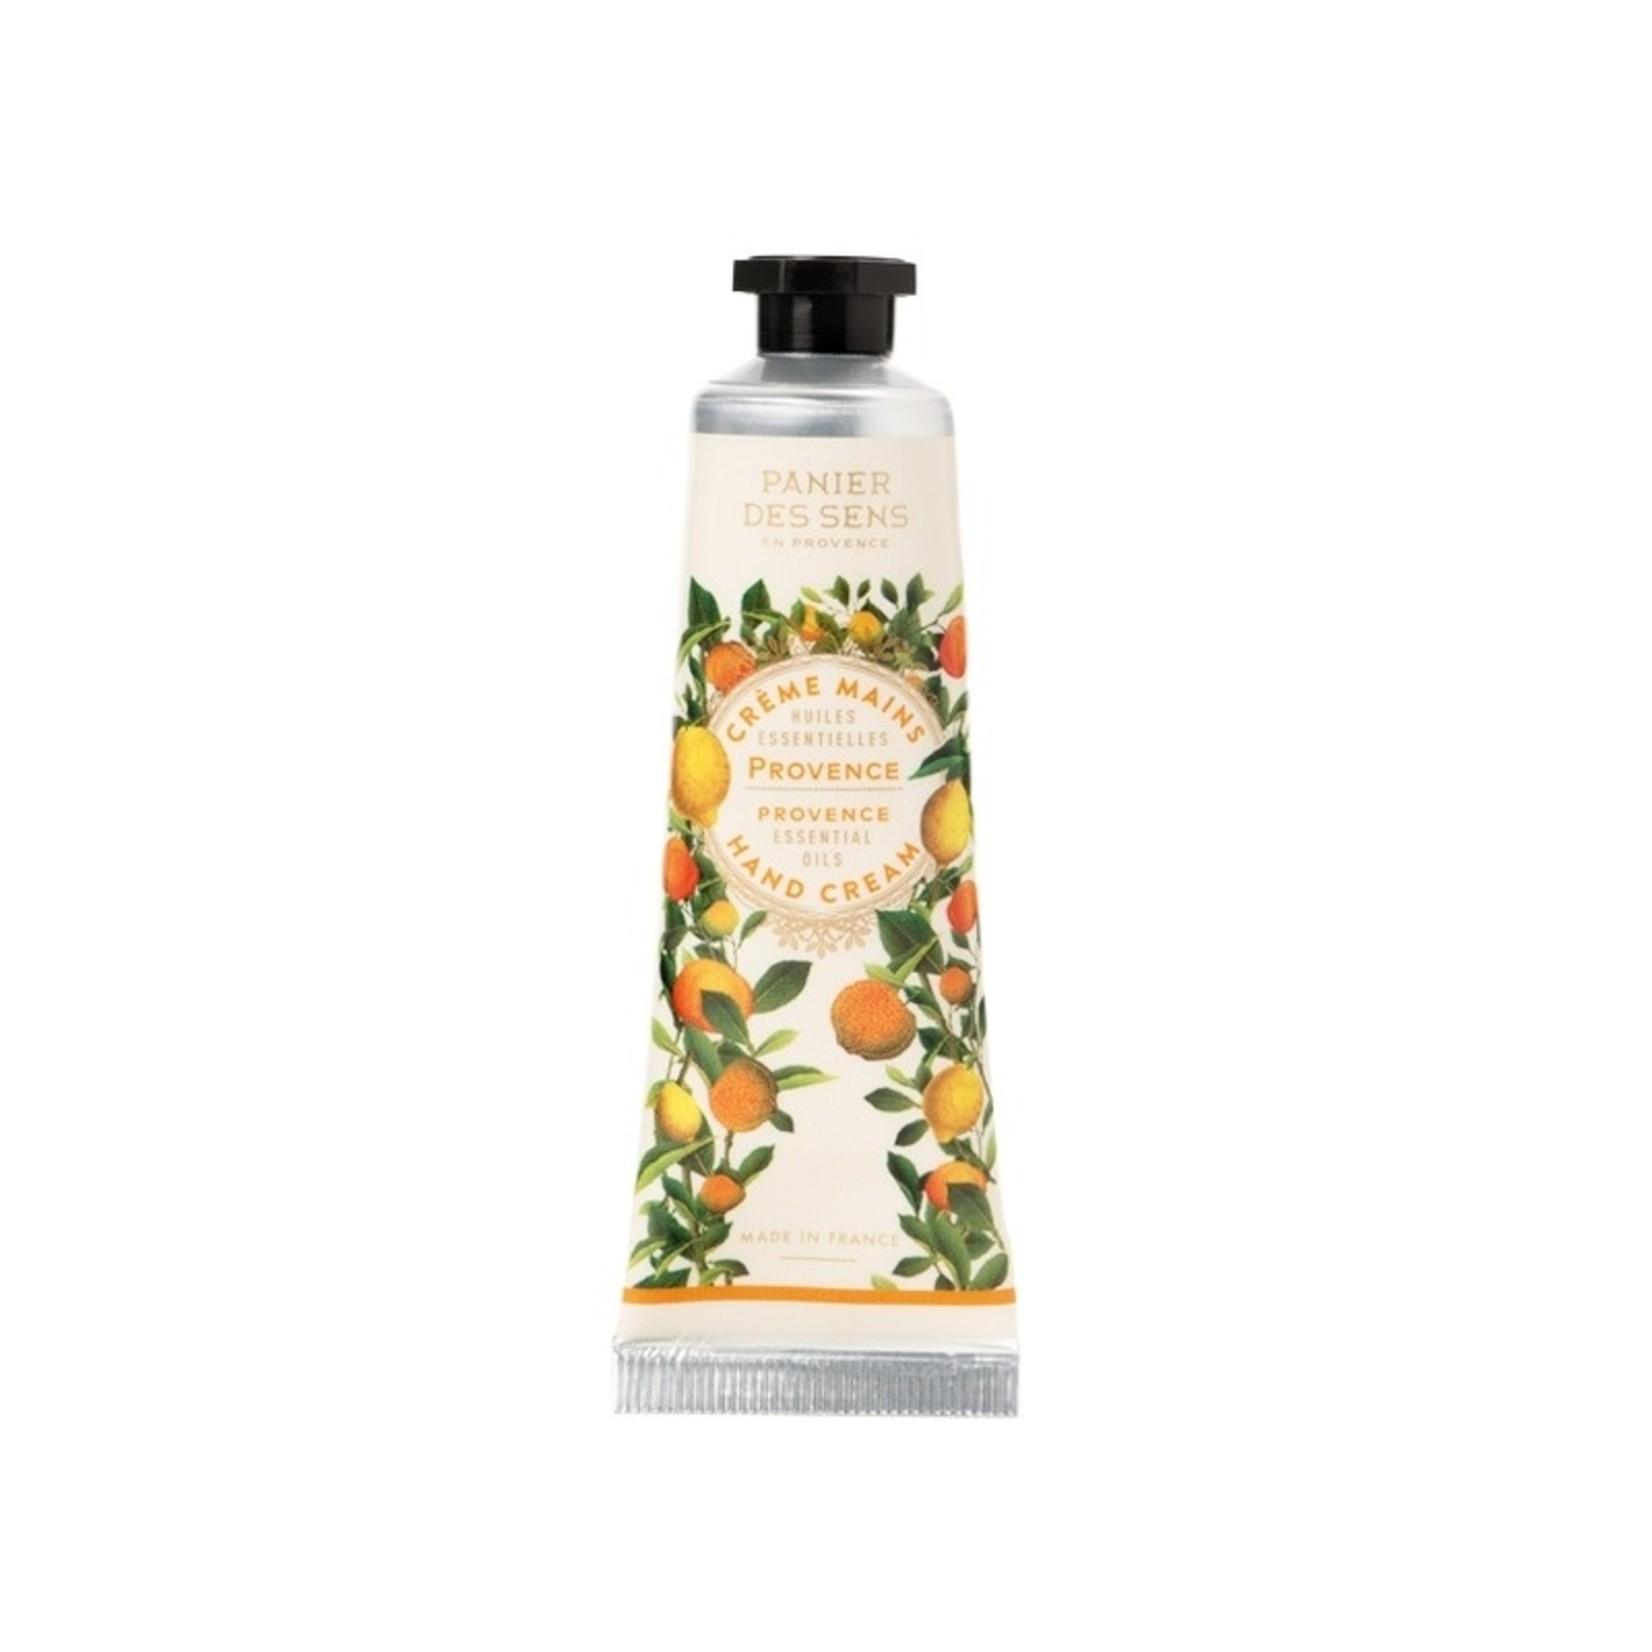 Panier Des Sens Mini Hand Cream